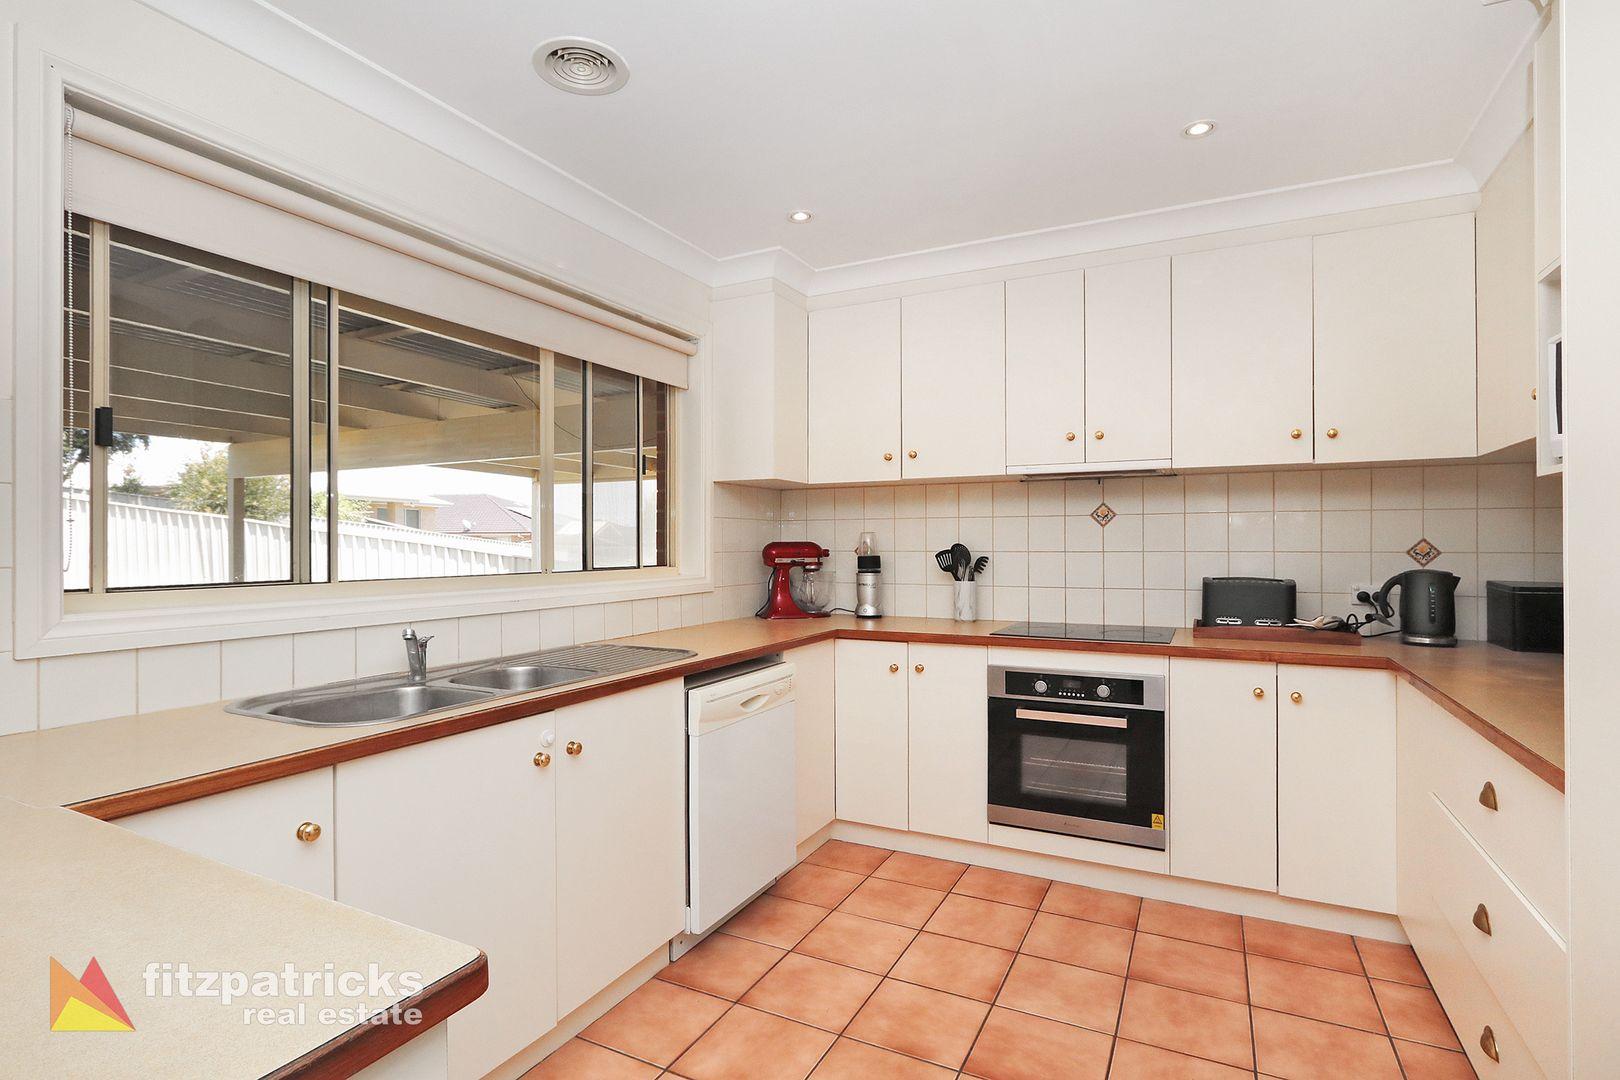 46 Bourkelands Drive, Bourkelands NSW 2650, Image 2